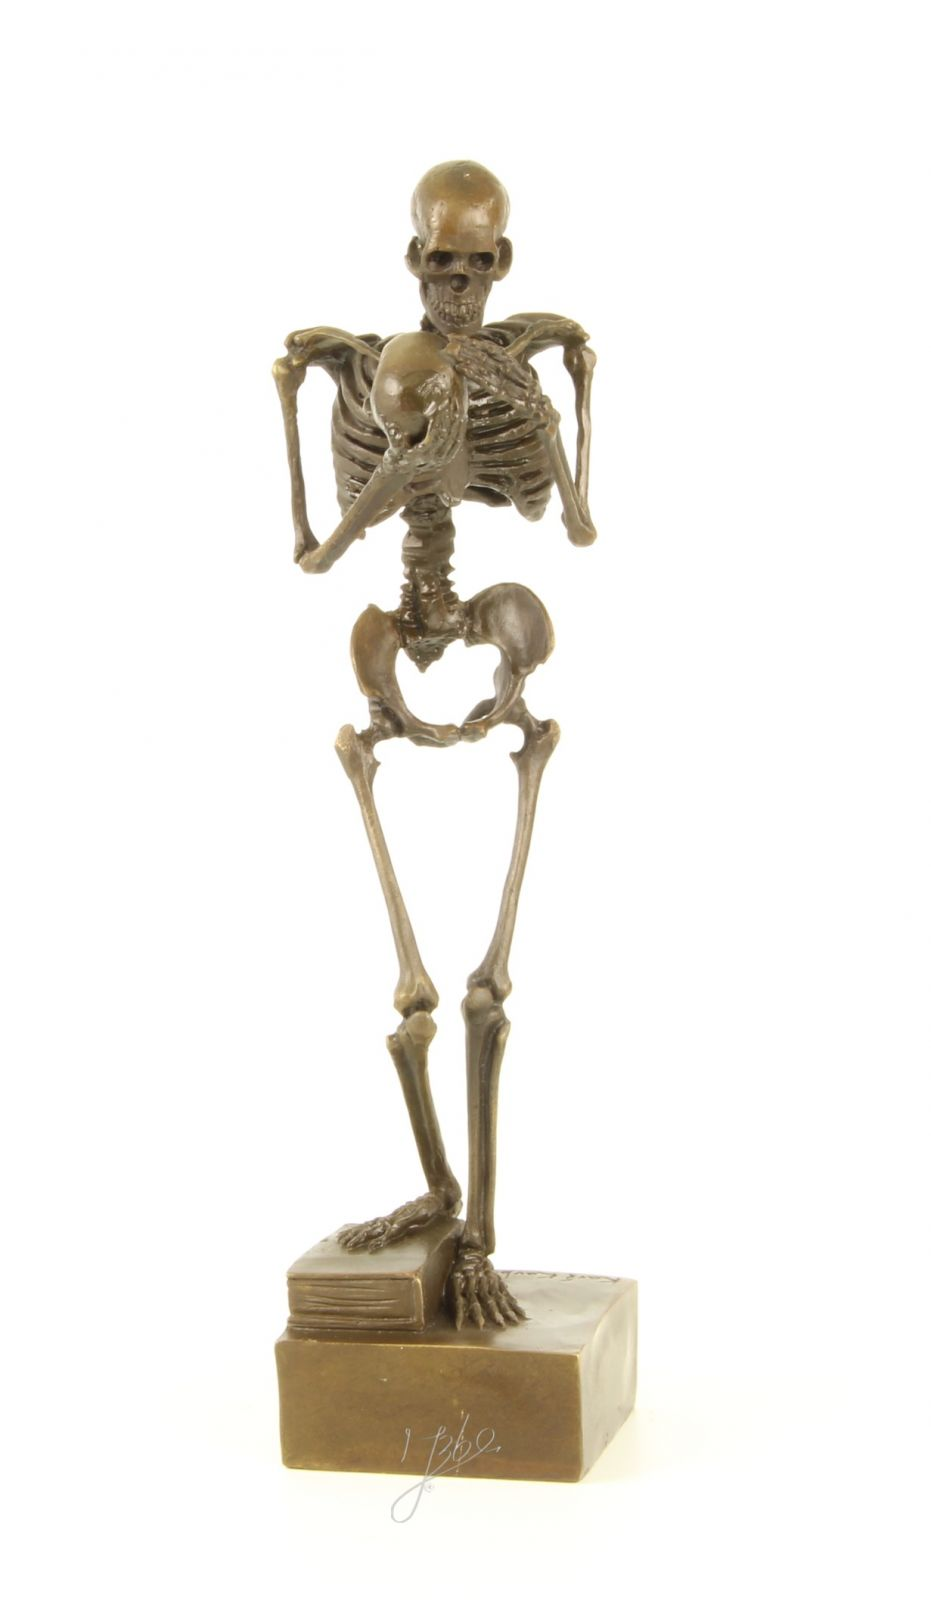 Бронзовая фигура скелета BrokInCZ